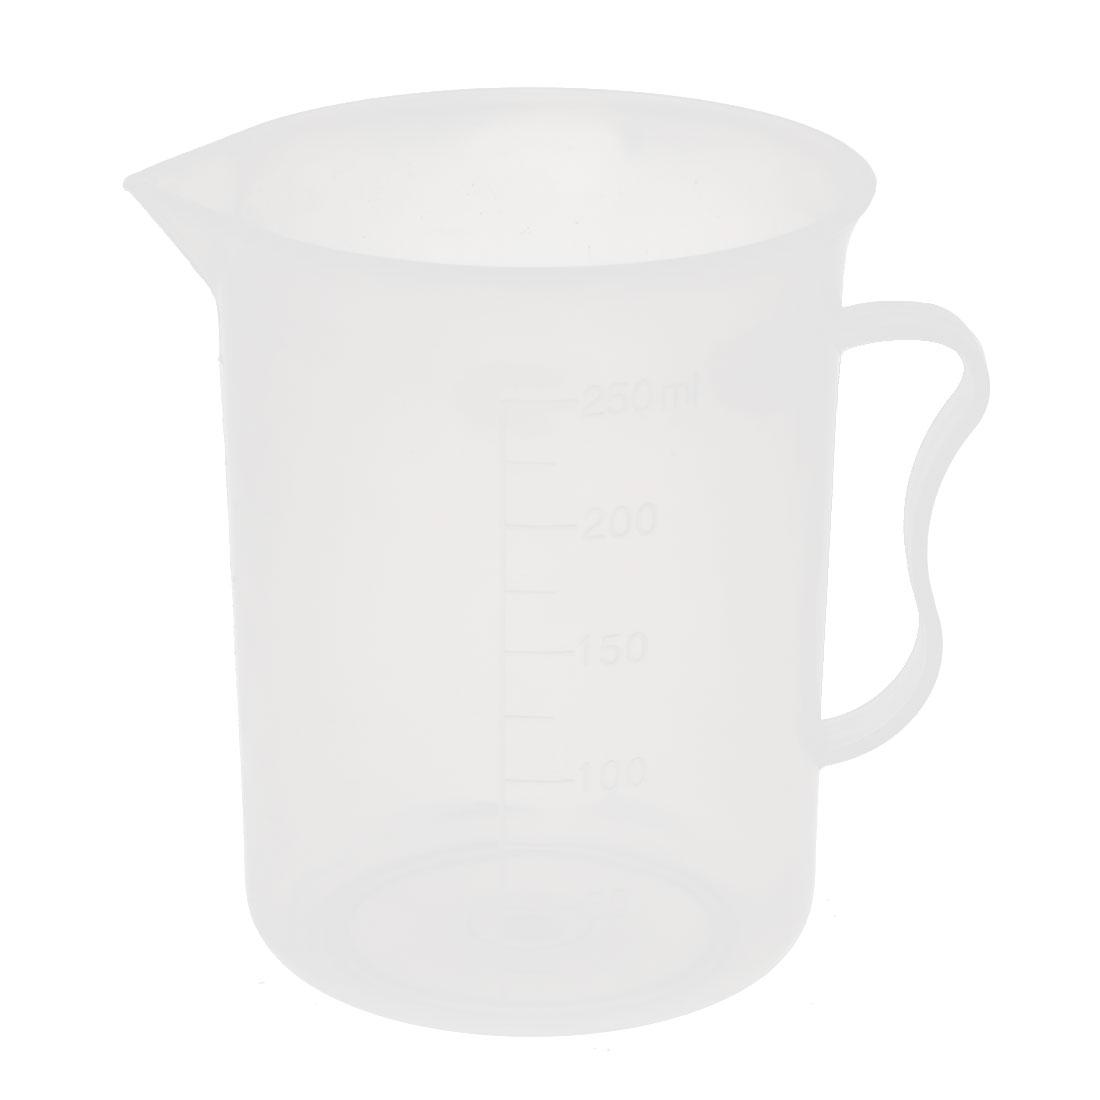 250mL Laboratory Spout Measuring Cup Beaker Clear w Handle